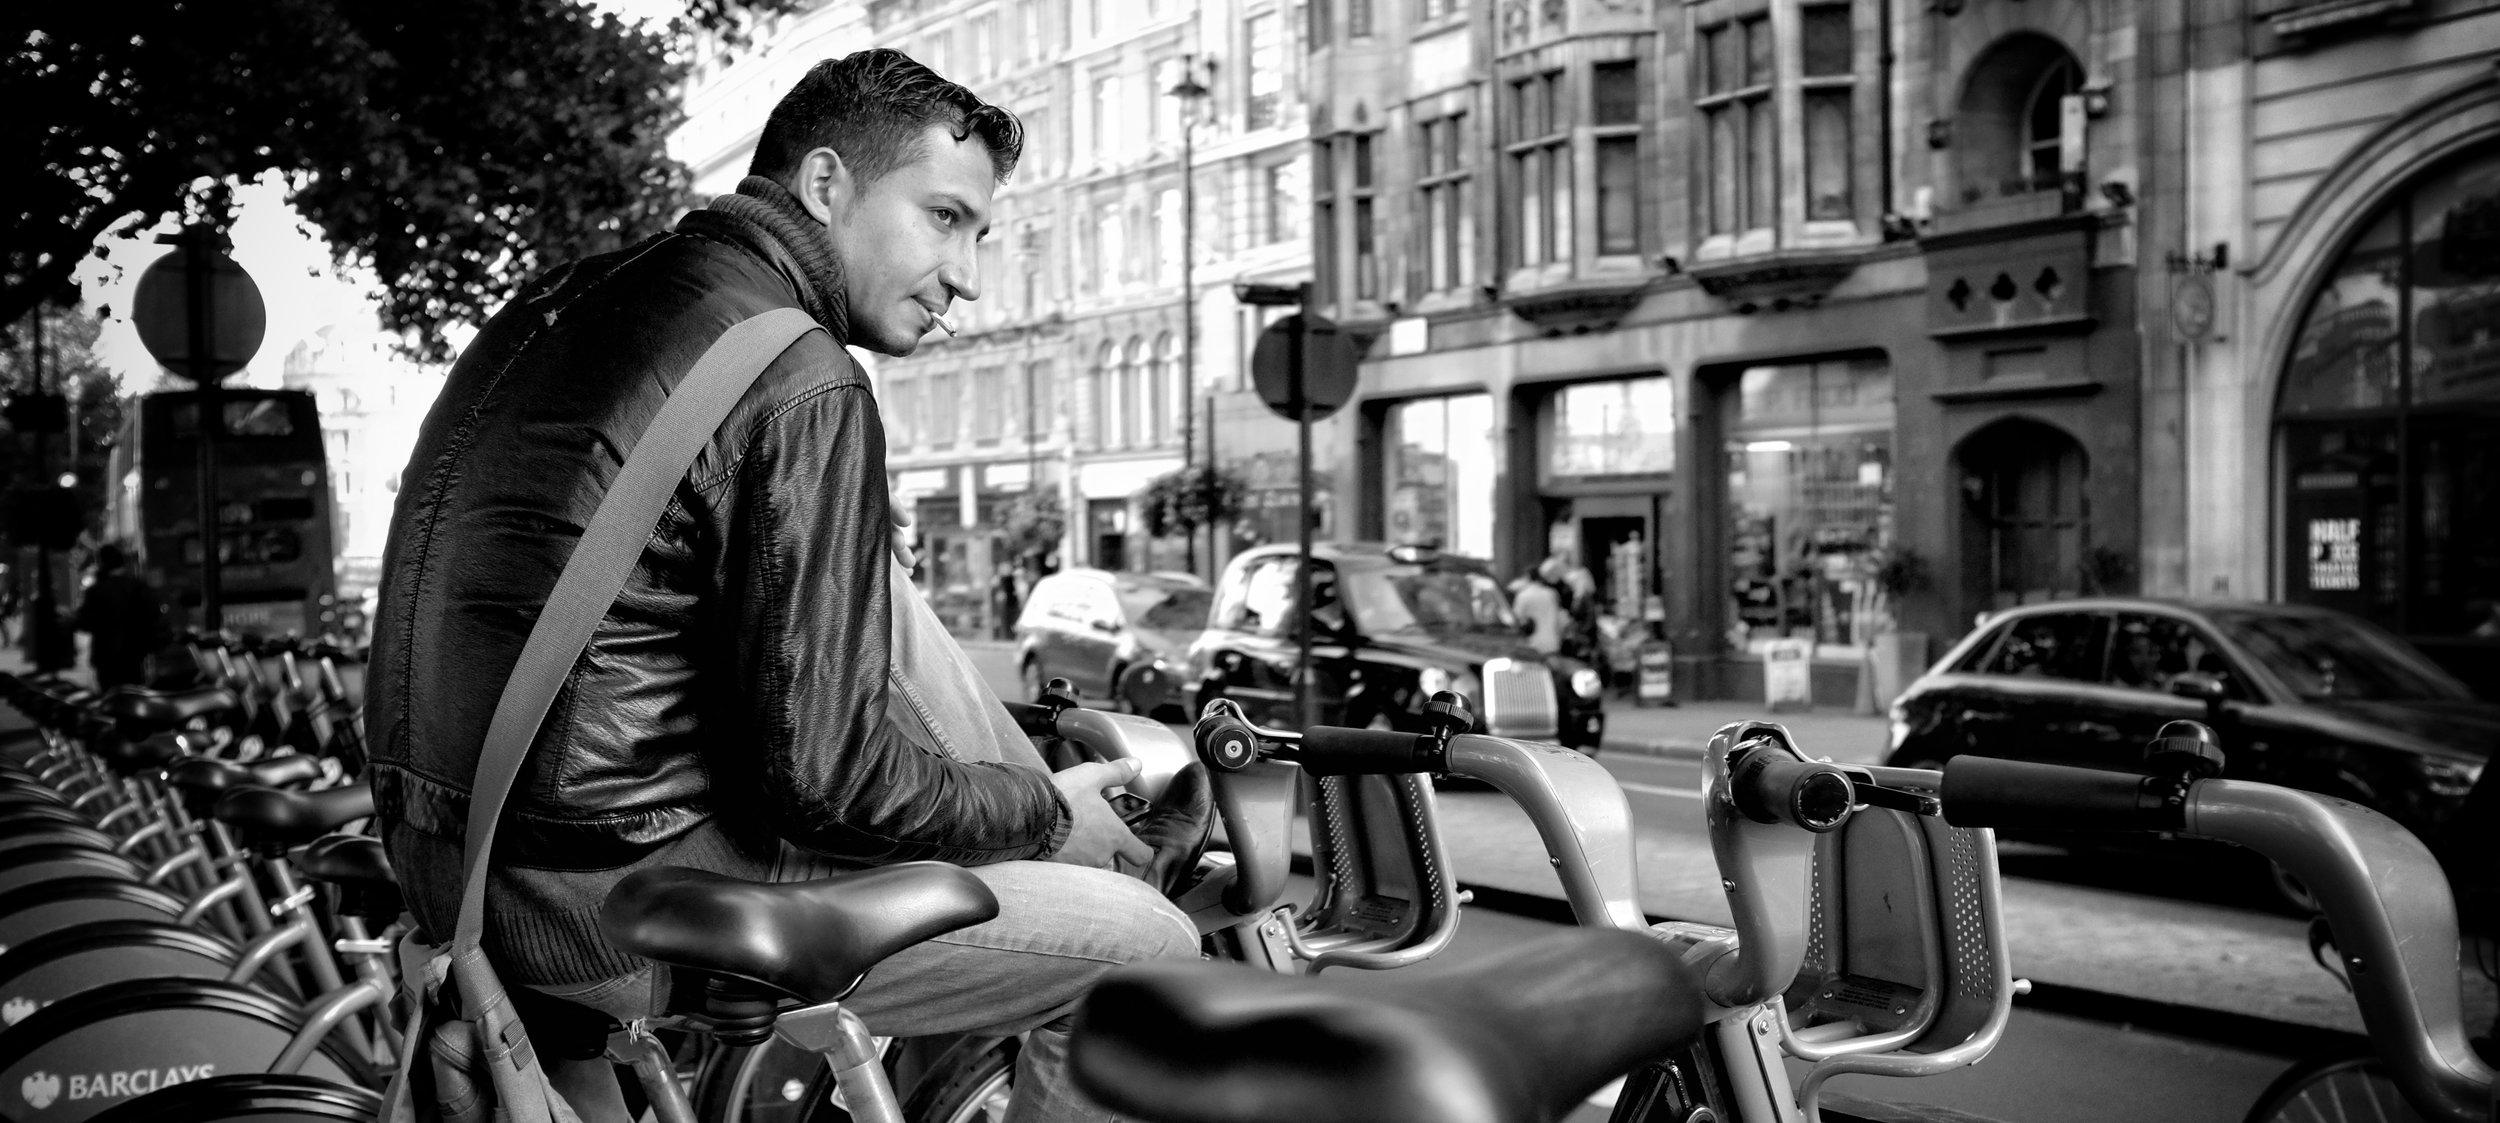 street_london.jpg